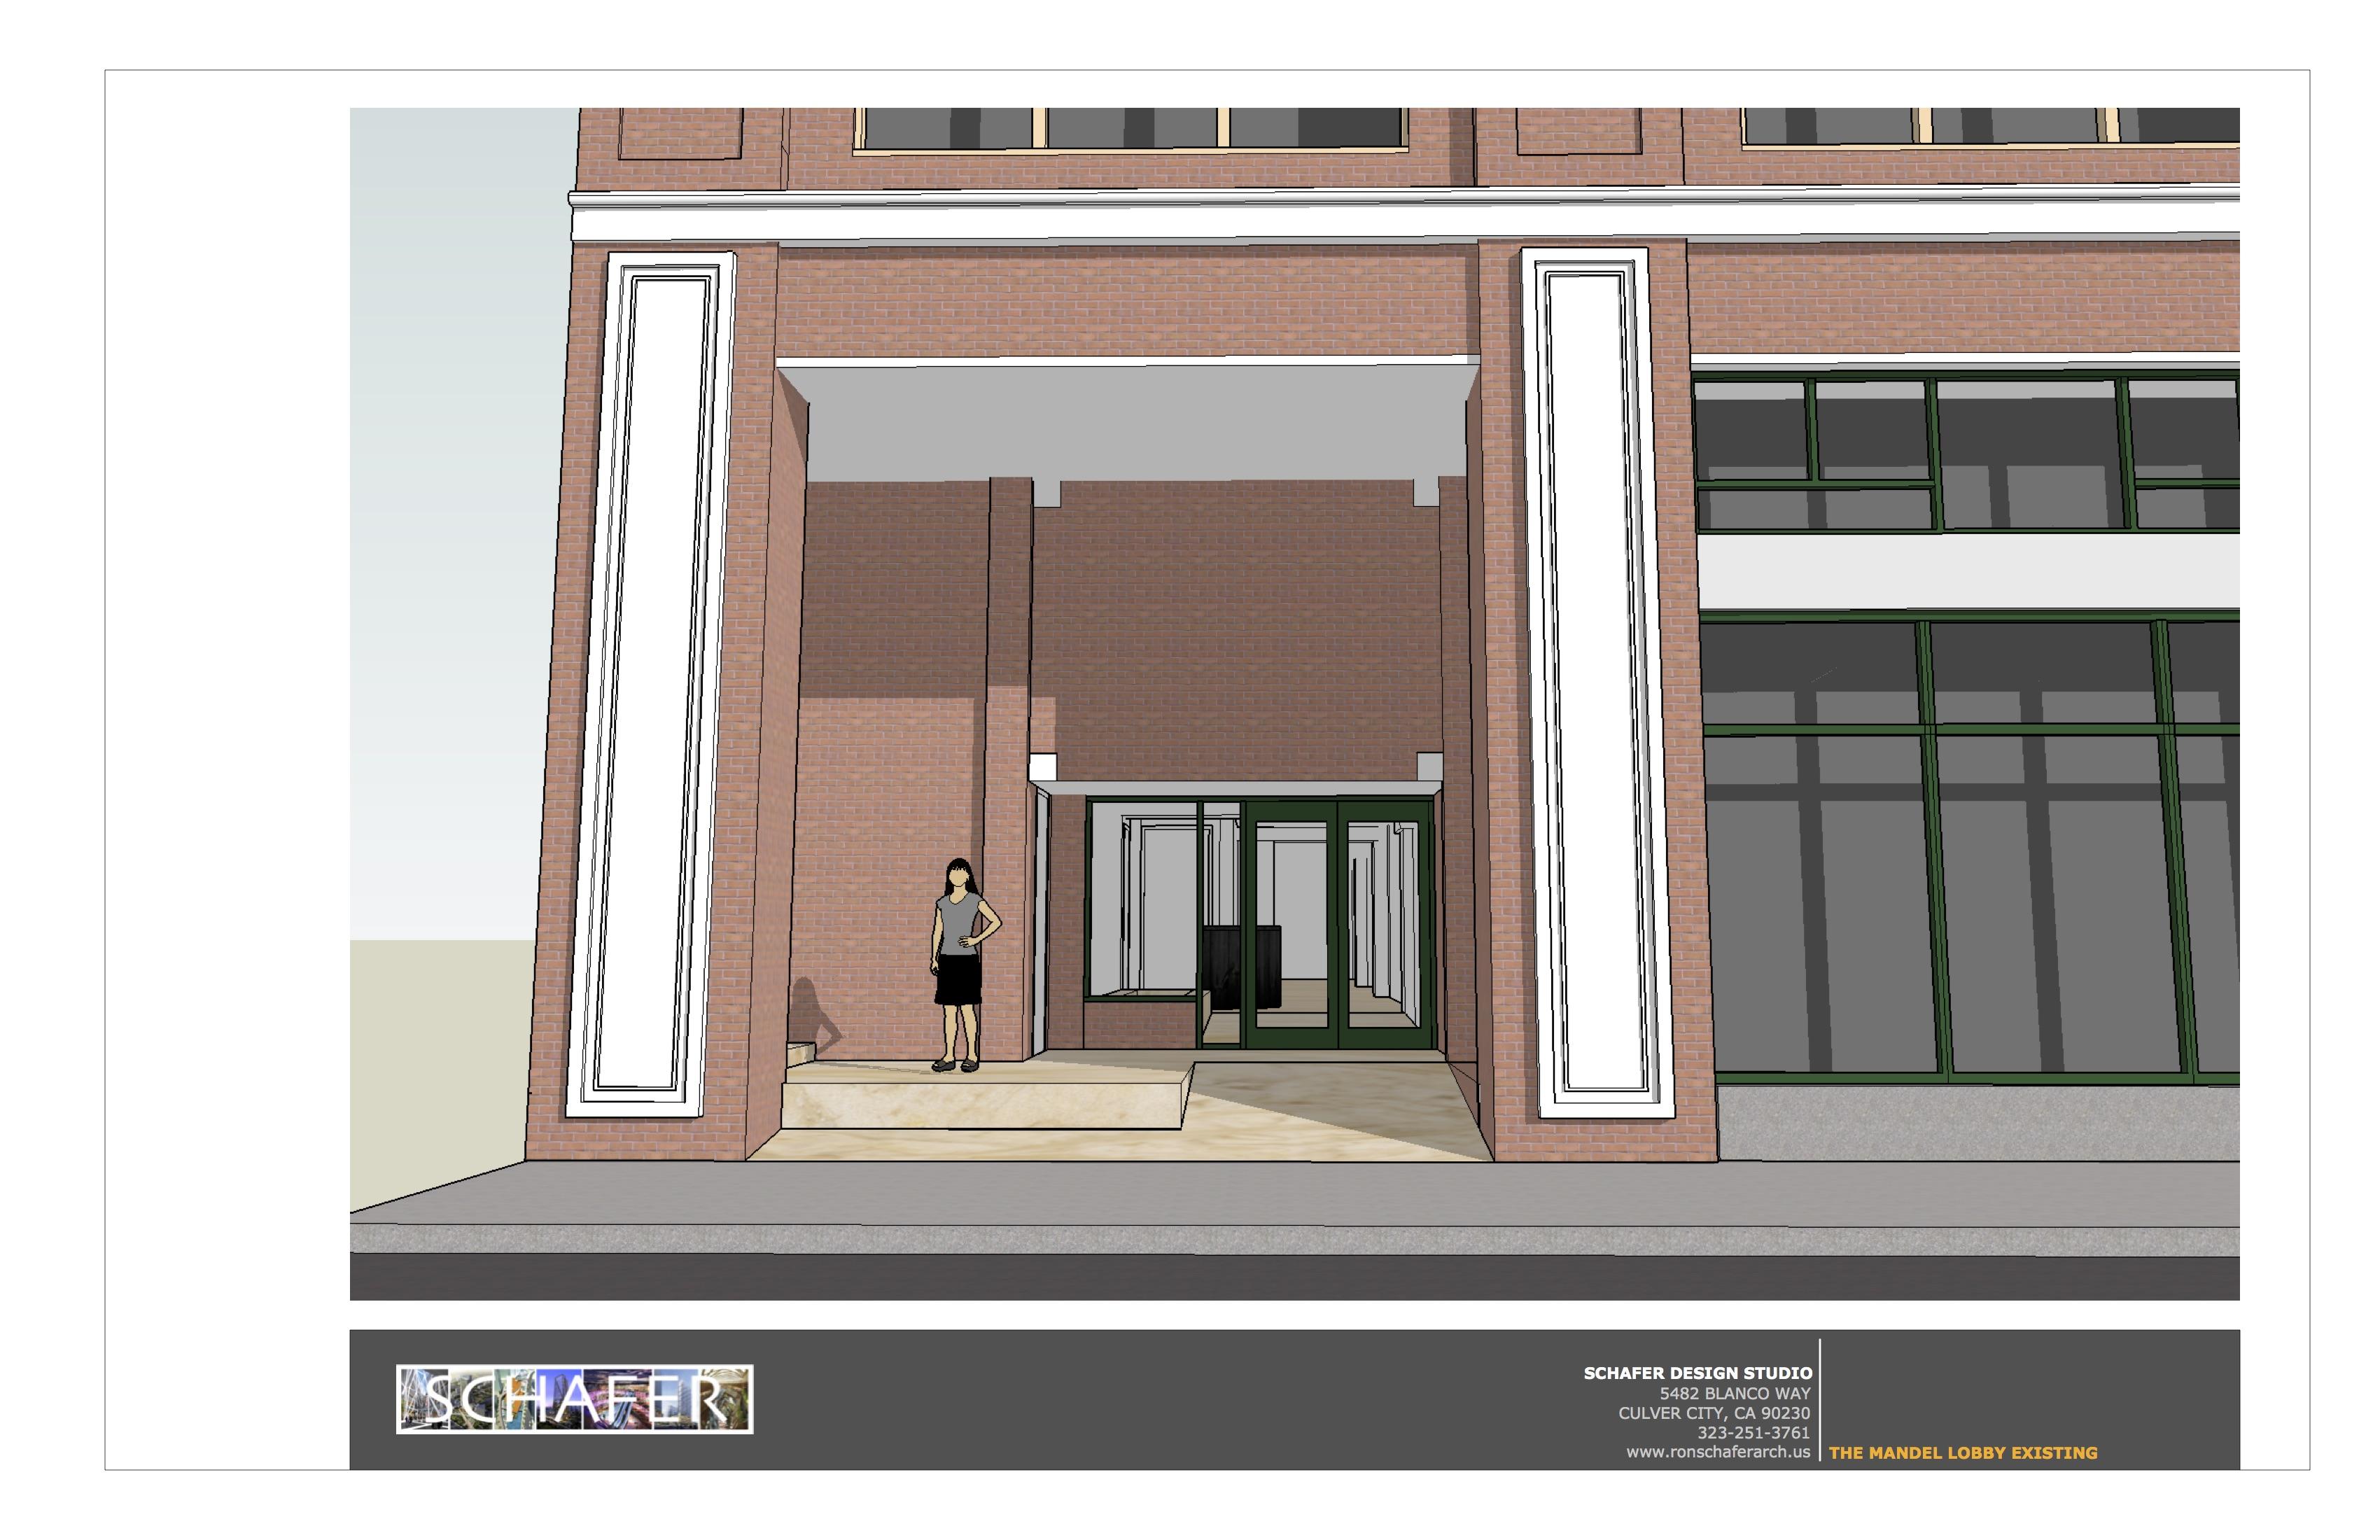 existing facade perspective